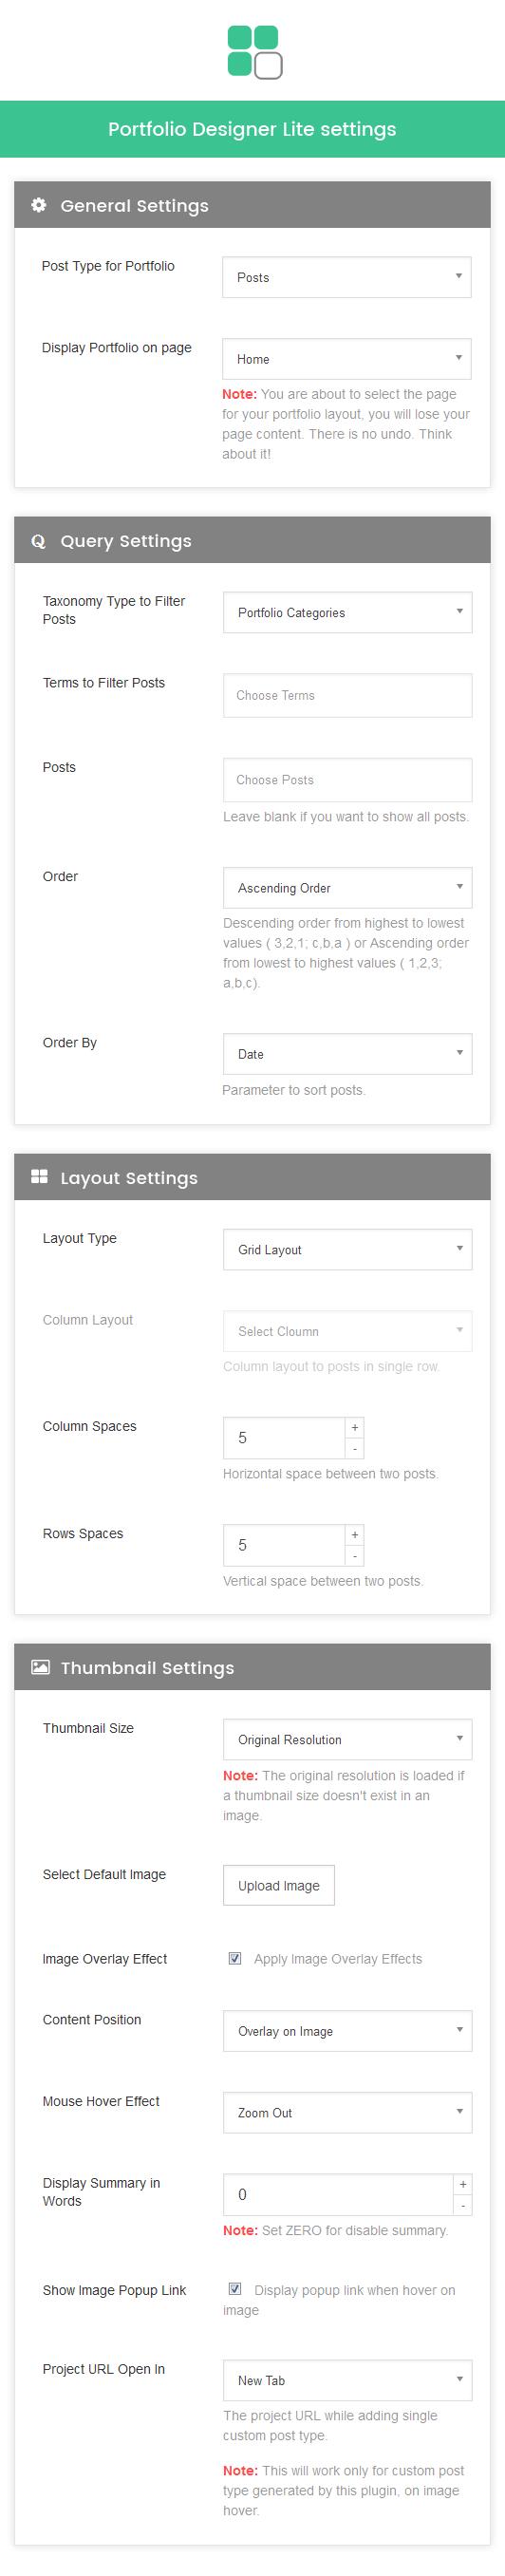 Portfolio Designer Panel - Admin Interface